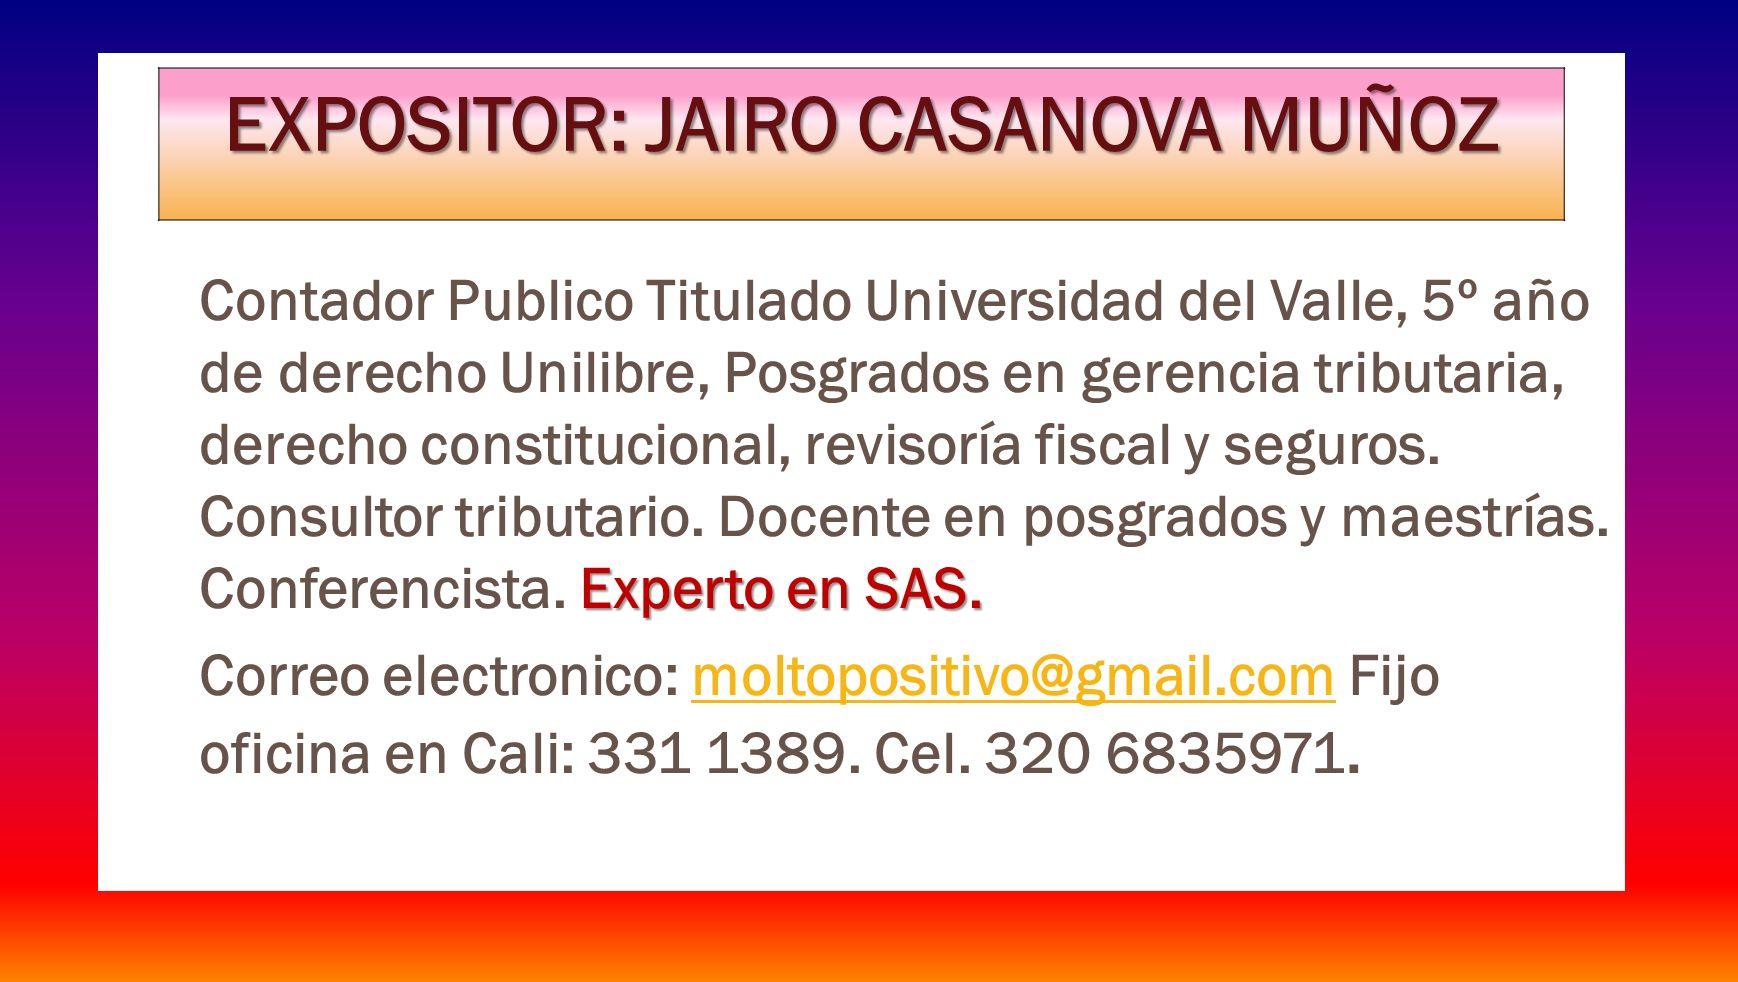 EXPOSITOR: JAIRO CASANOVA MUÑOZ